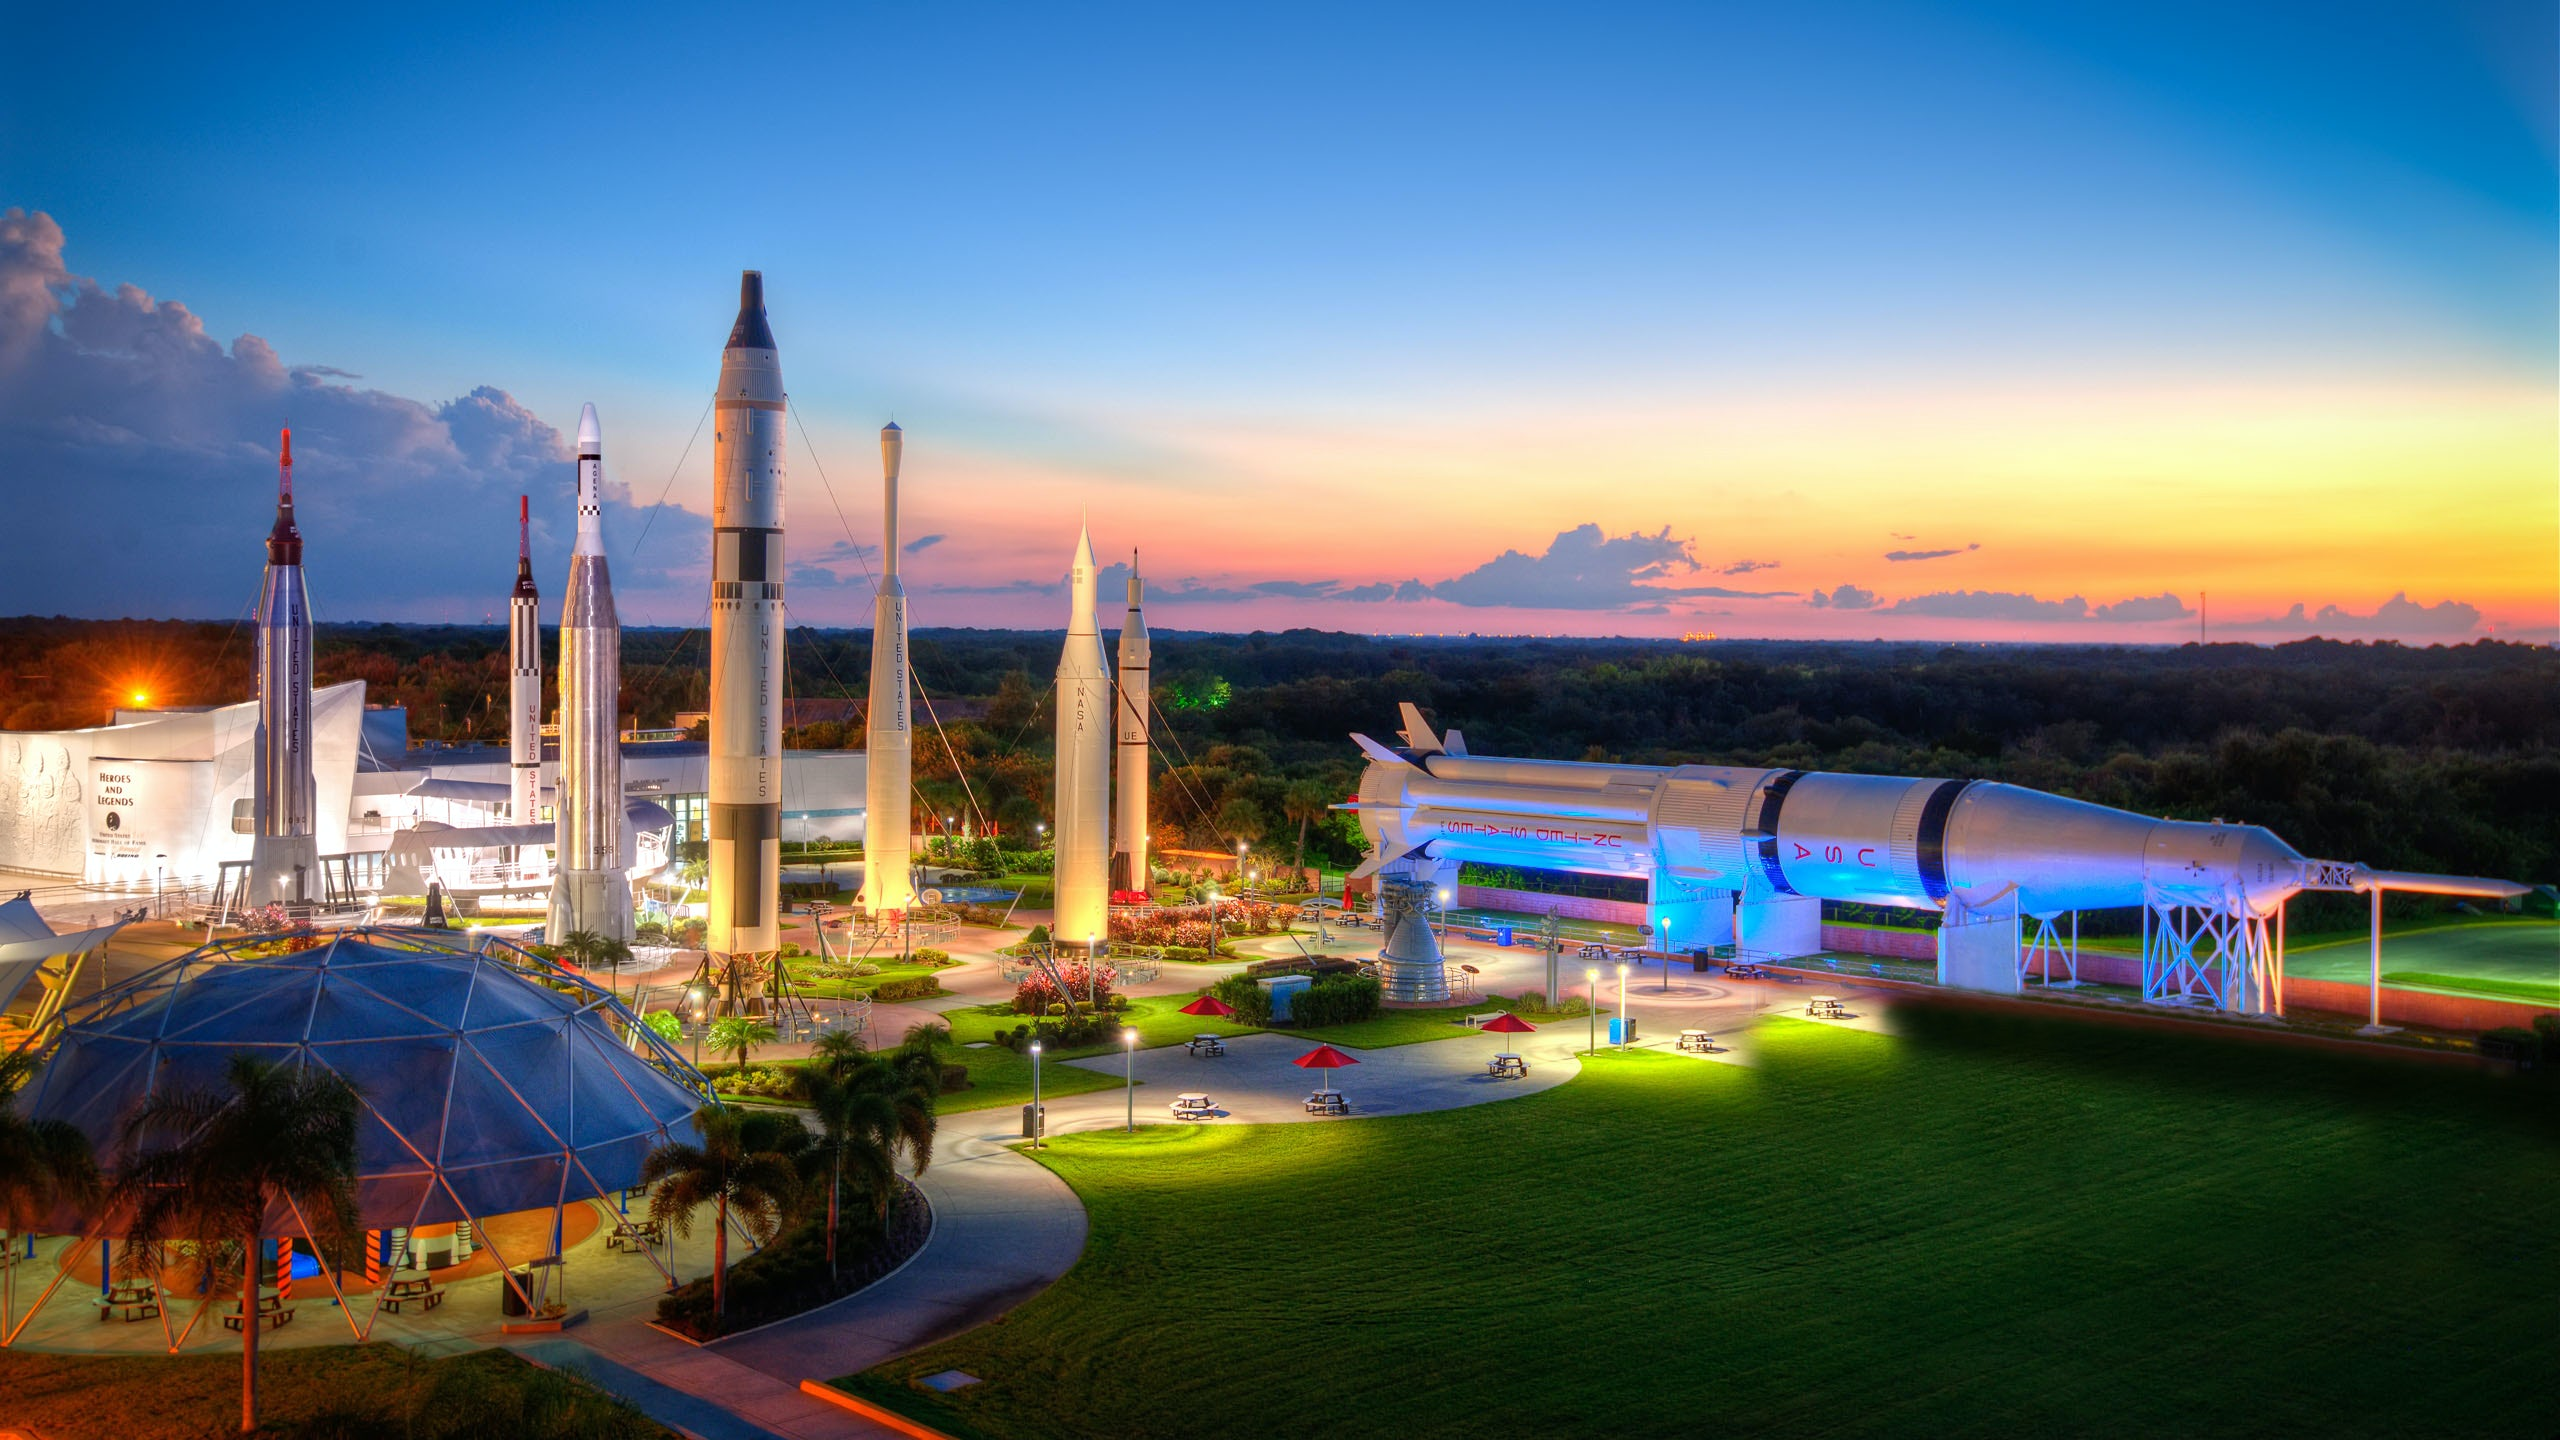 discount kennedy space center tickets orlandofunticketscom - HD2560×1440